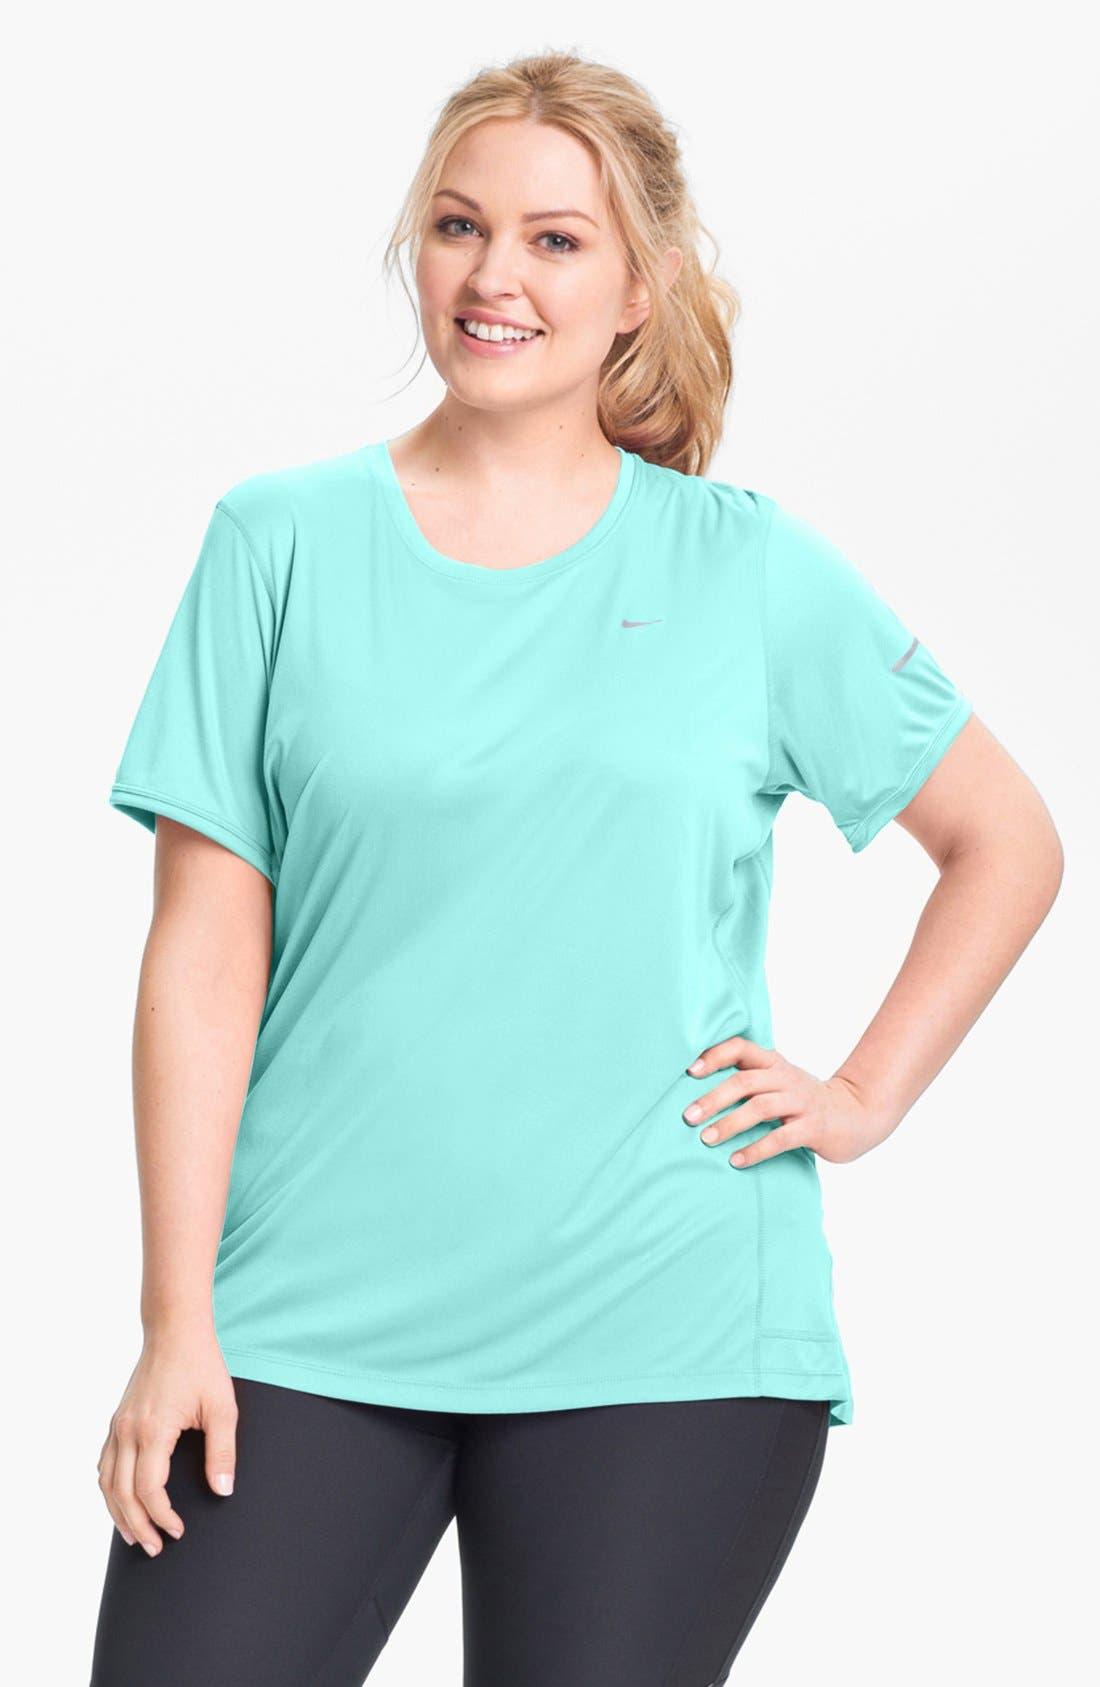 Main Image - Nike 'Miler' Short Sleeve Tee (Plus Size)